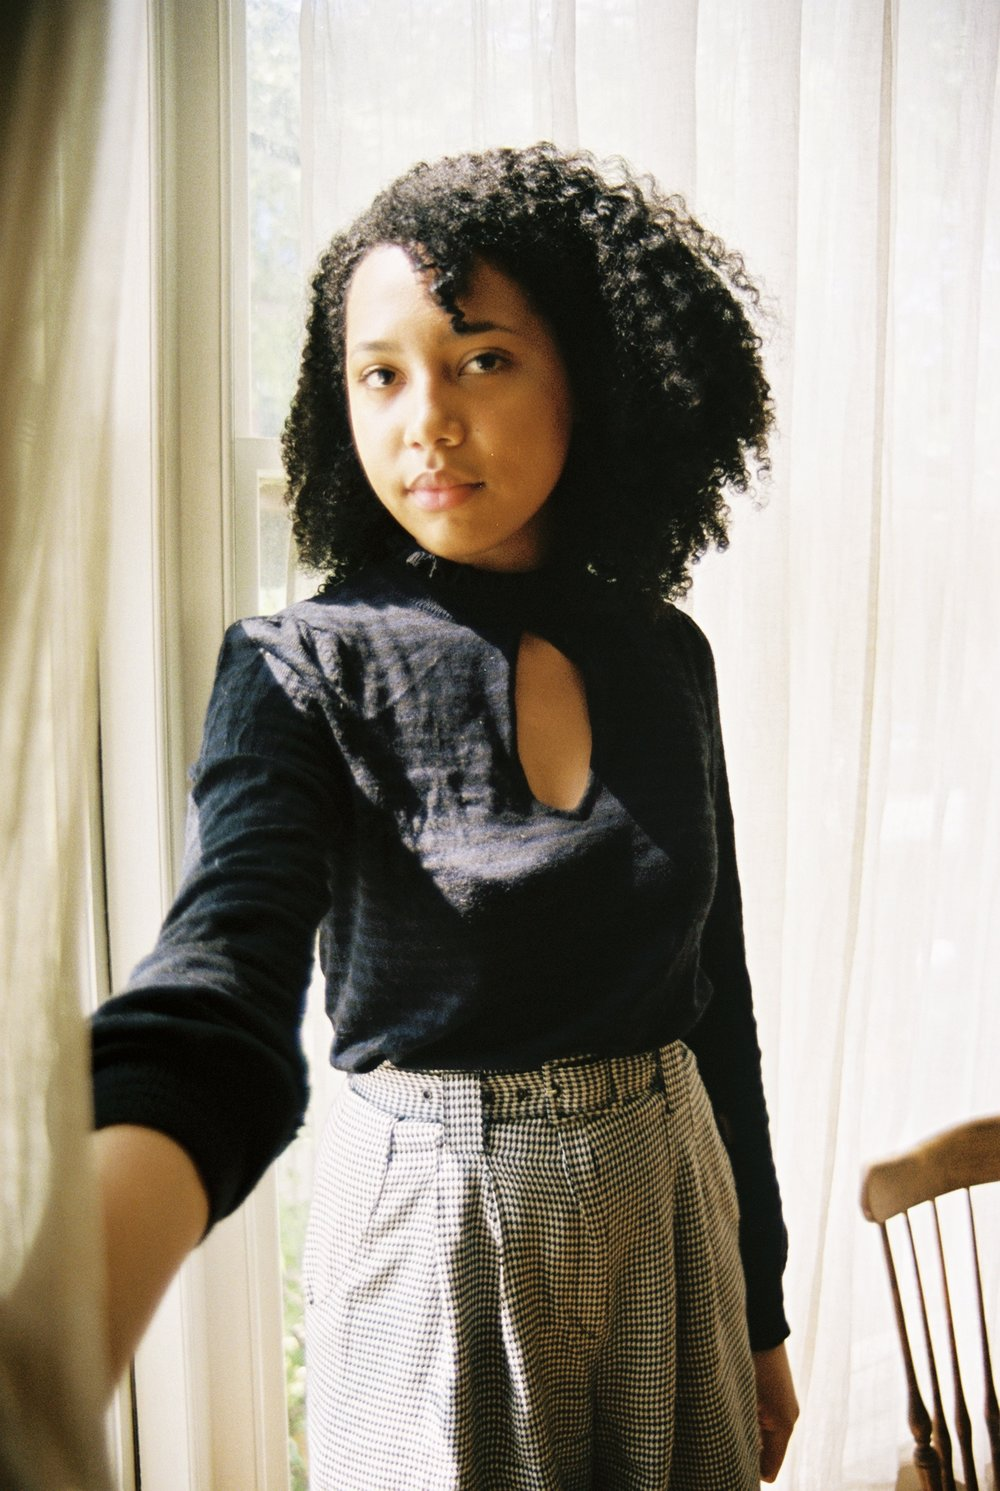 Alyssa captured by Natalie Yang